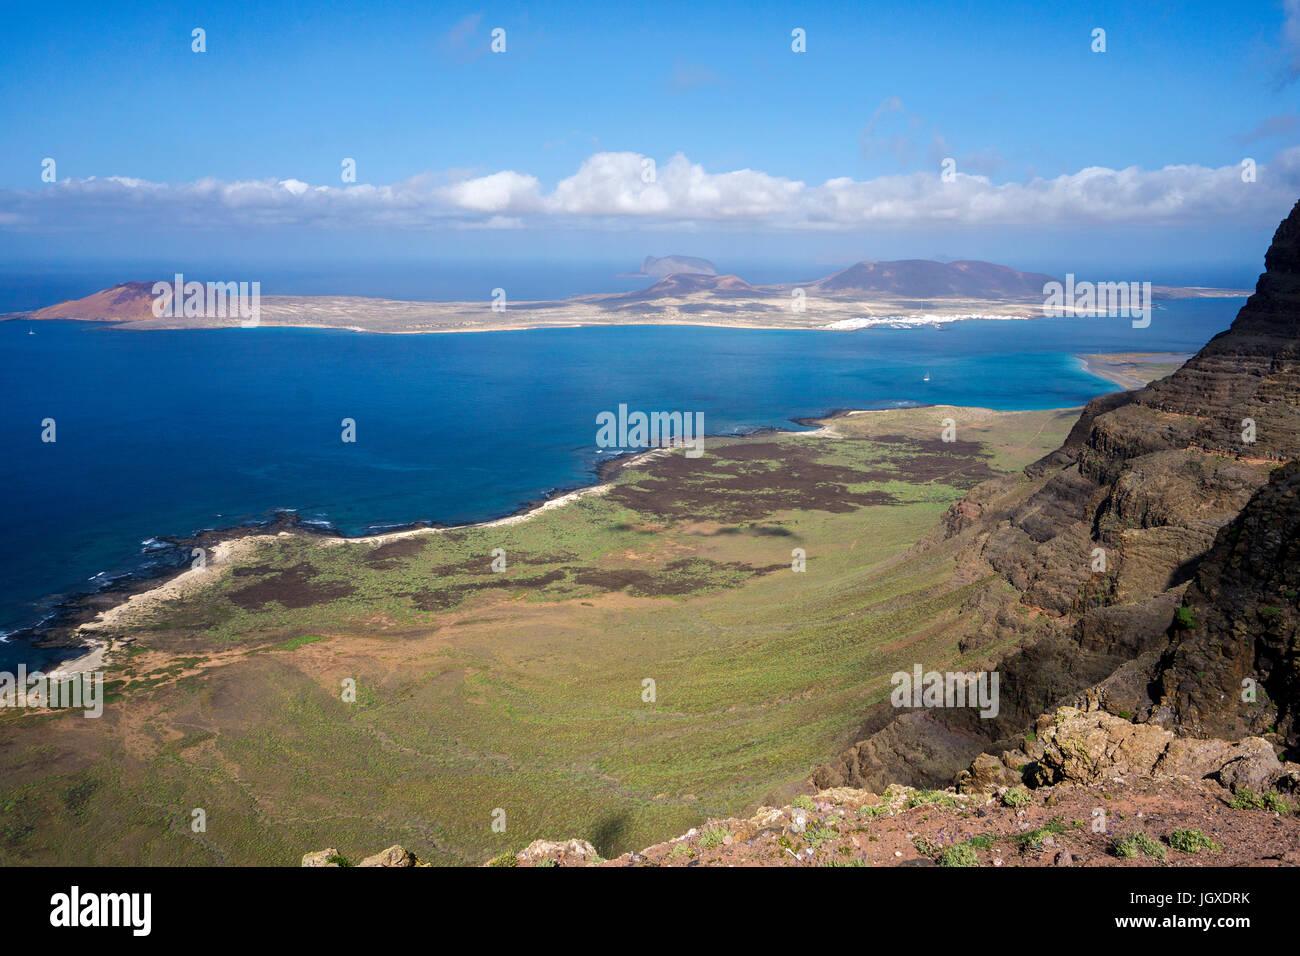 Blick vom Mirador de Guinate auf die Insel La Graciosa, Lanzarote, Kanarische Inseln, Europa   View from Mirador de Guinate to La Graciosa island, Lan Stock Photo